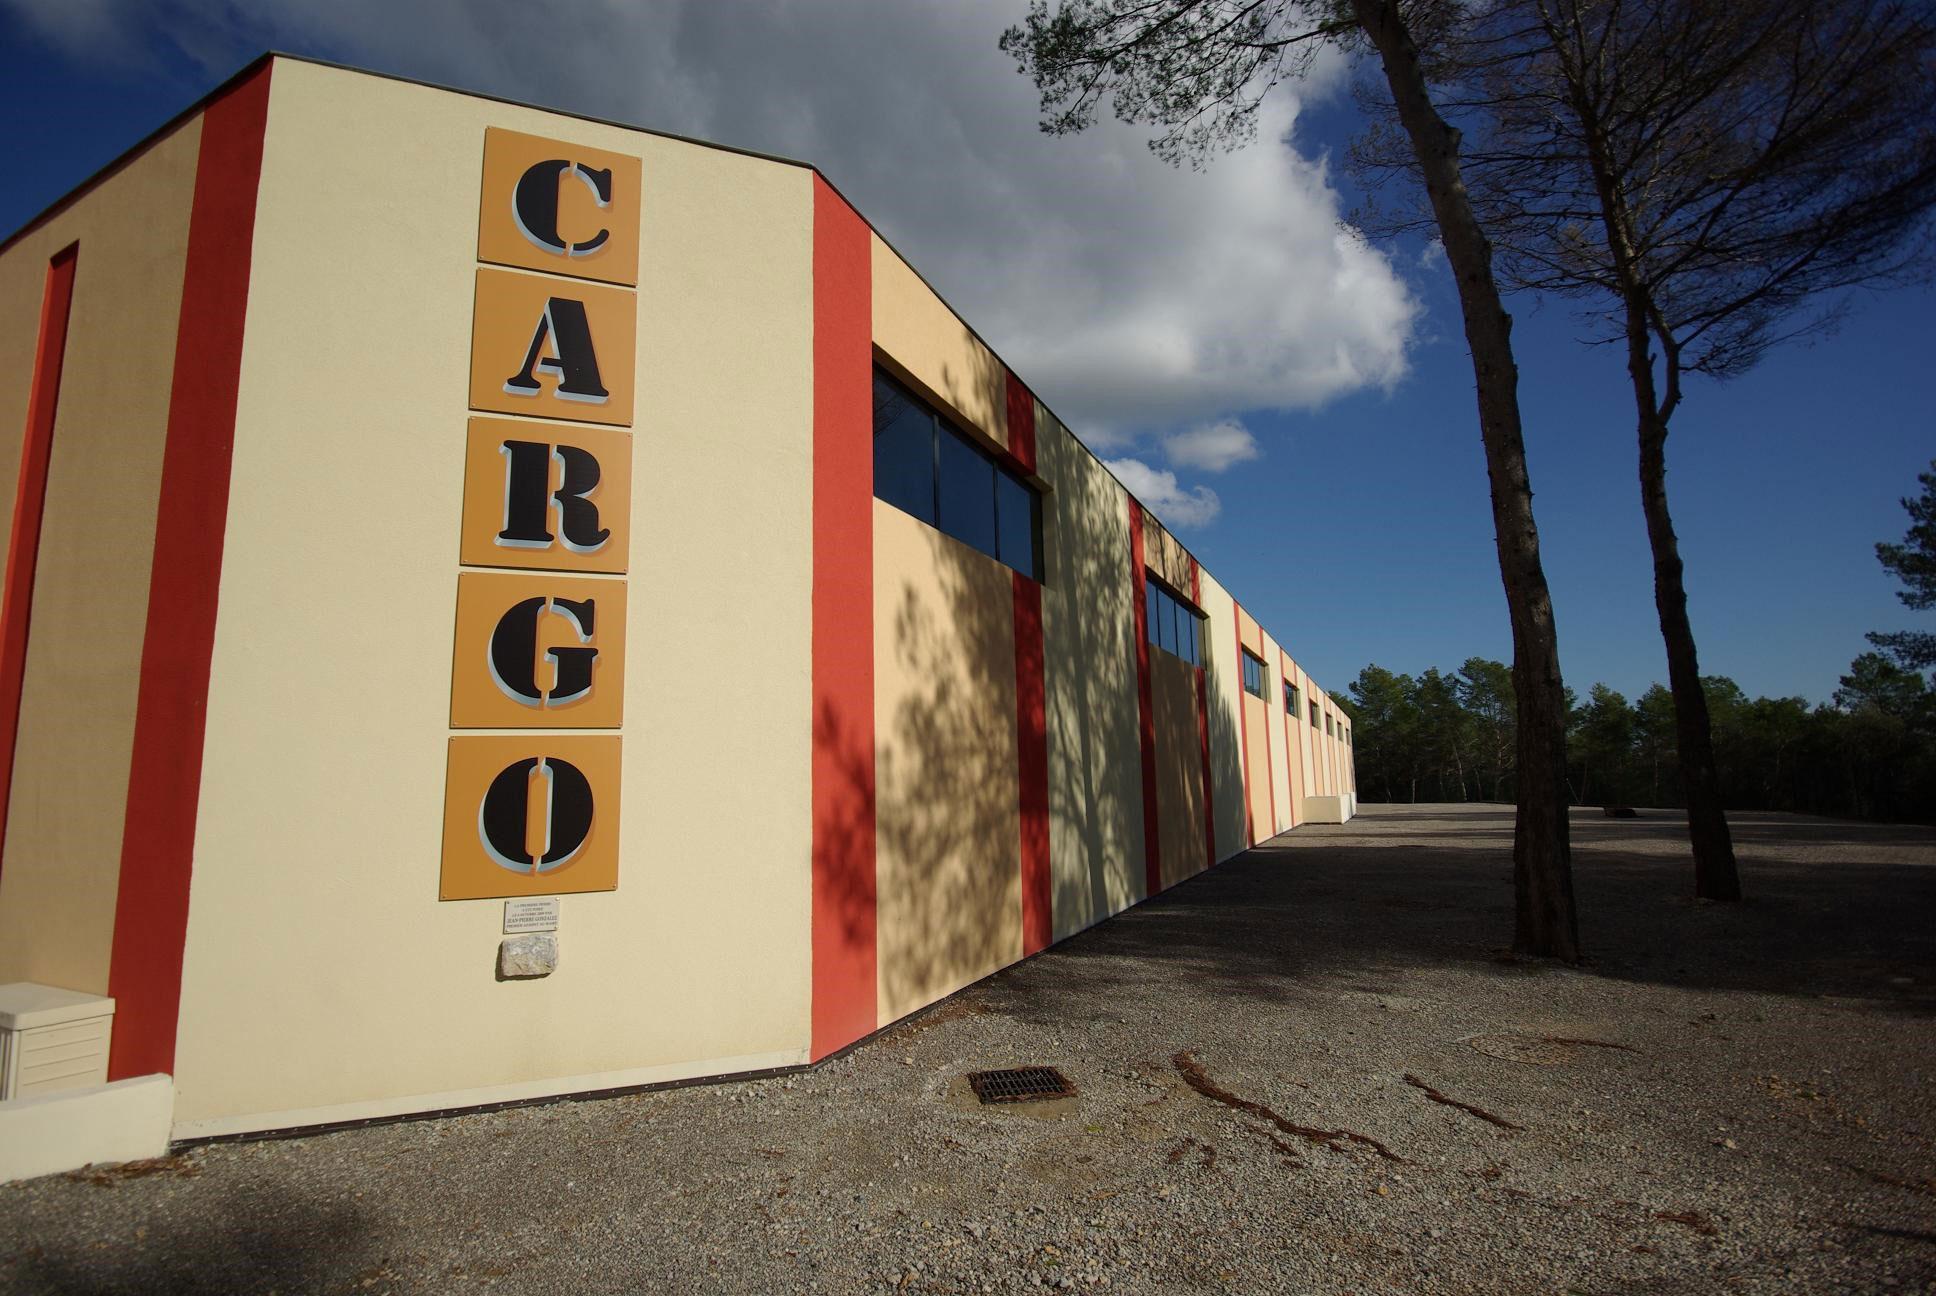 cargo-02